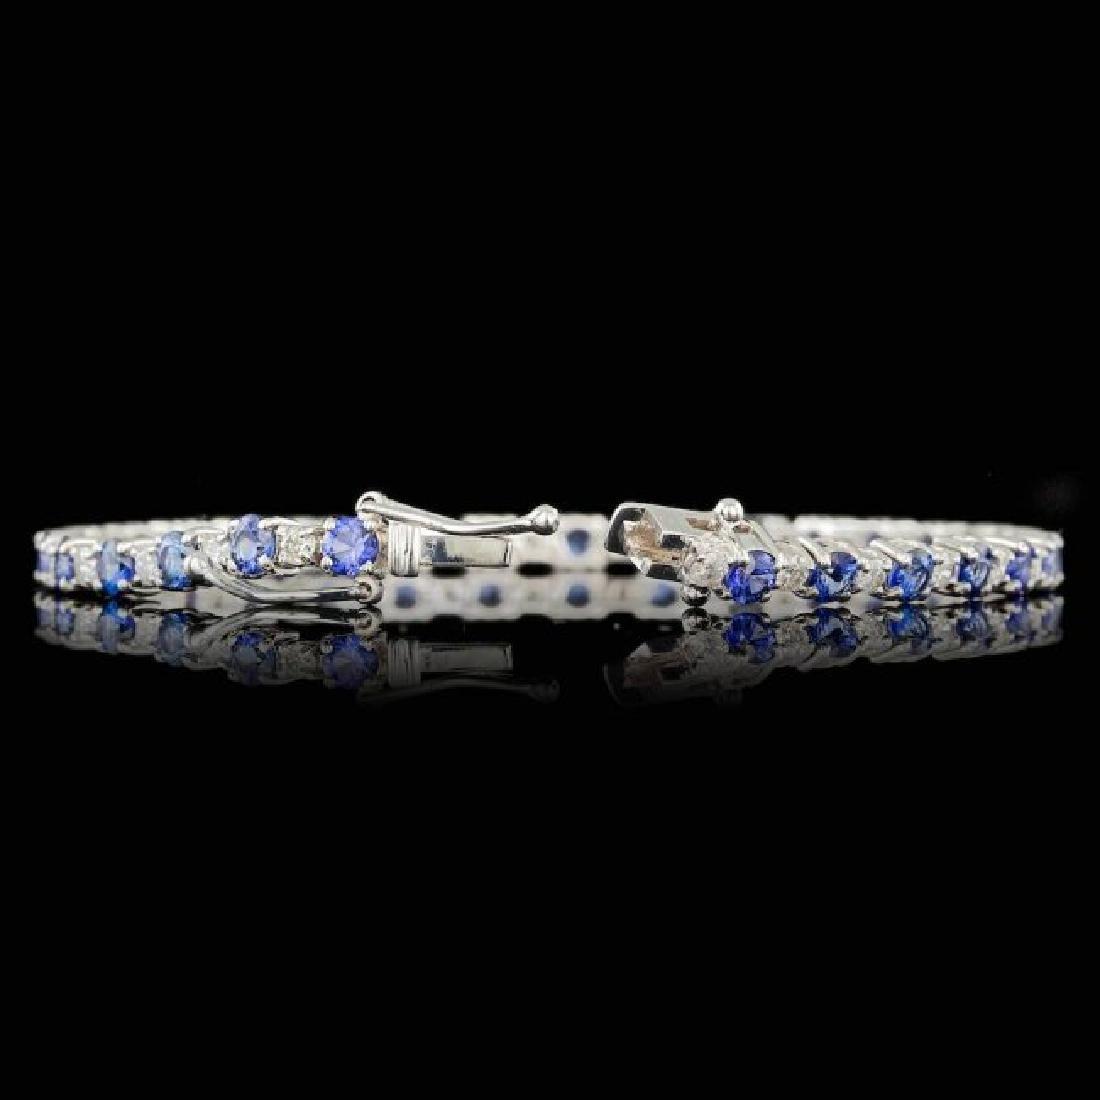 14k Gold 6.00ct Sapphire 1.65ct Diamond Bracelet - 2